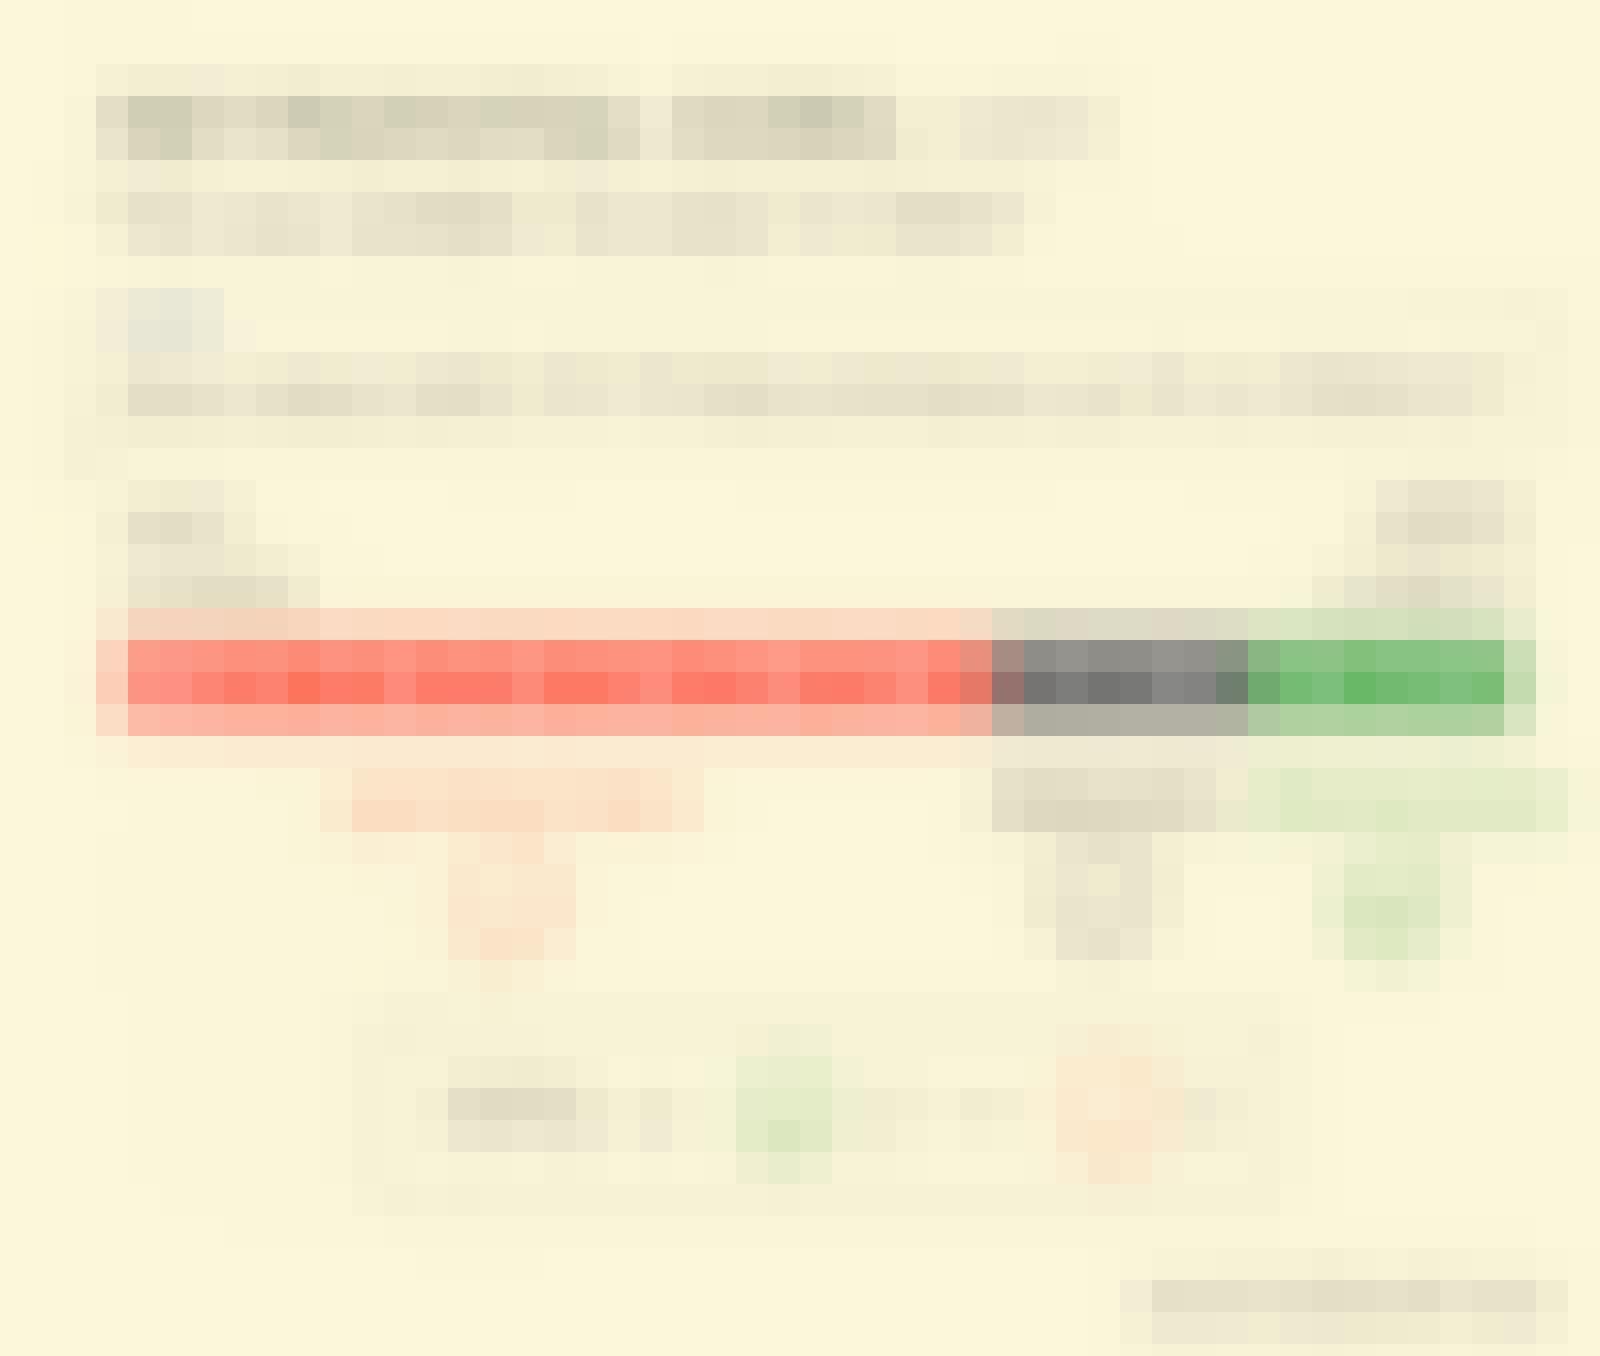 Net Promoter Score - Sketchplanations